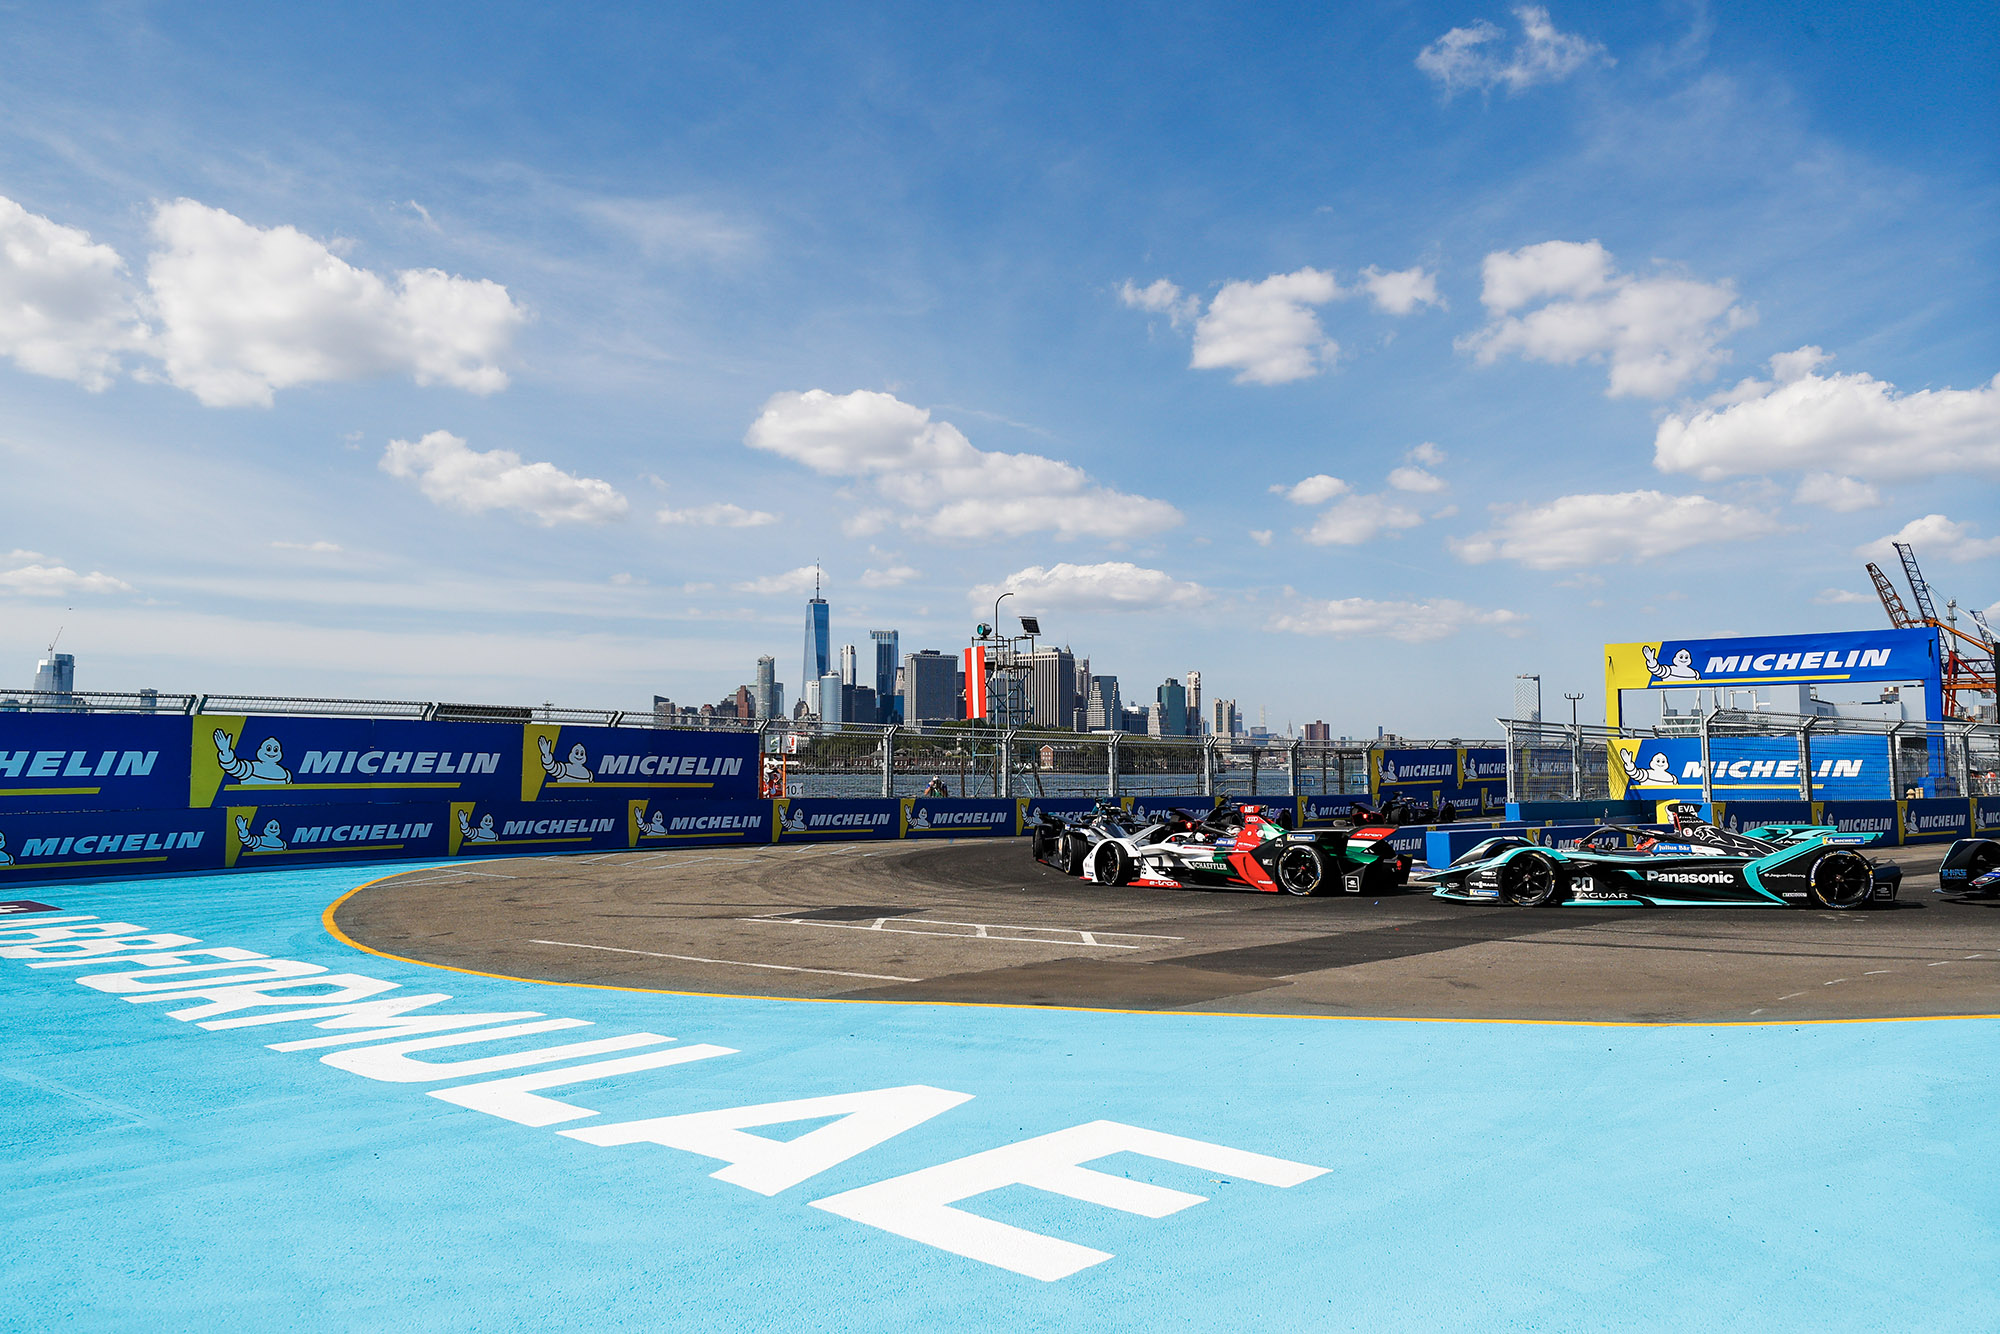 Shot of the skyline during the 2019 New York Formula E eprix